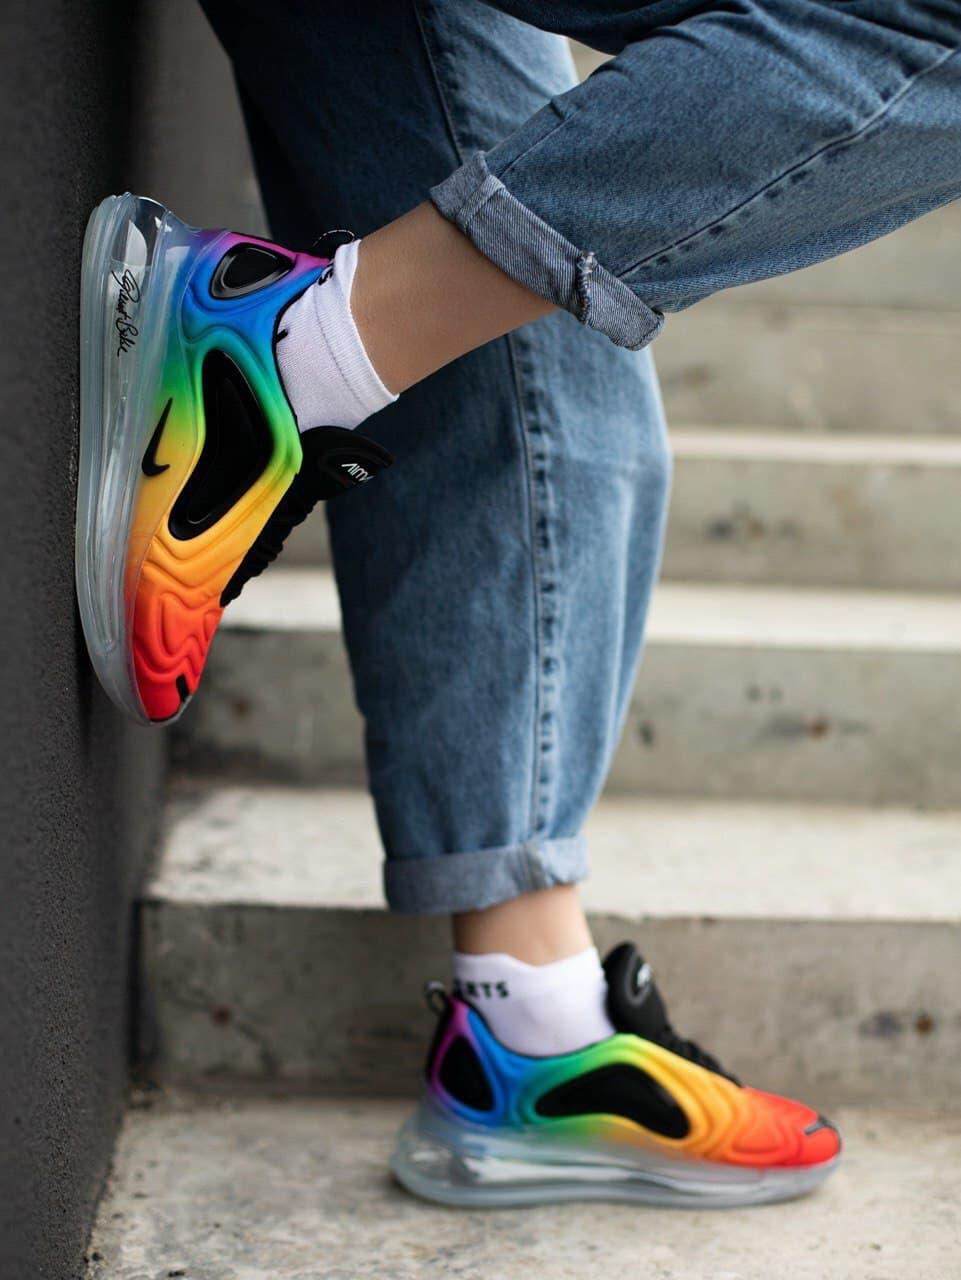 Кросівки Nike Air Max 720 Be True, Найк Аір Макс 720